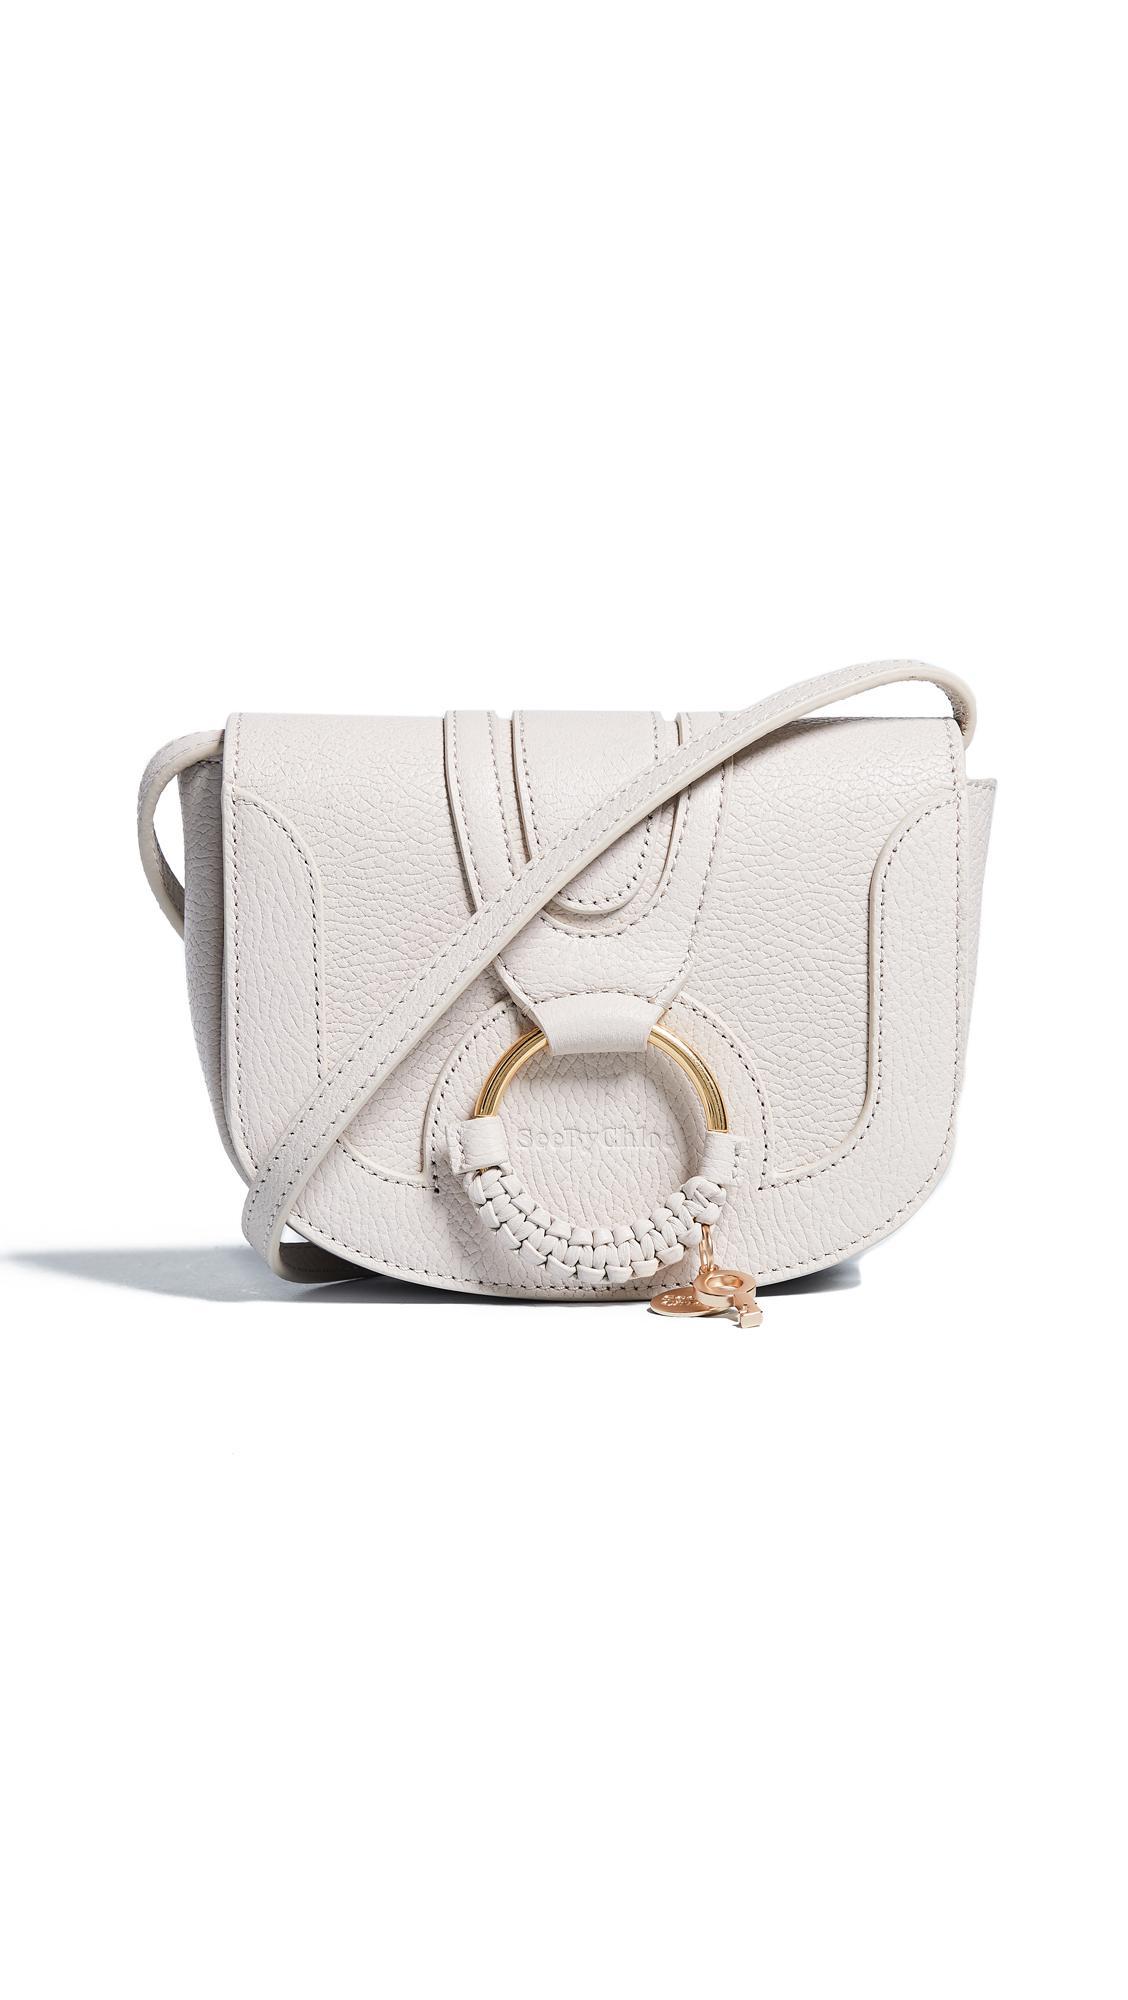 8e472c0ba1f1a See By ChloÉ Hana Mini Saddle Bag In Cement Beige | ModeSens